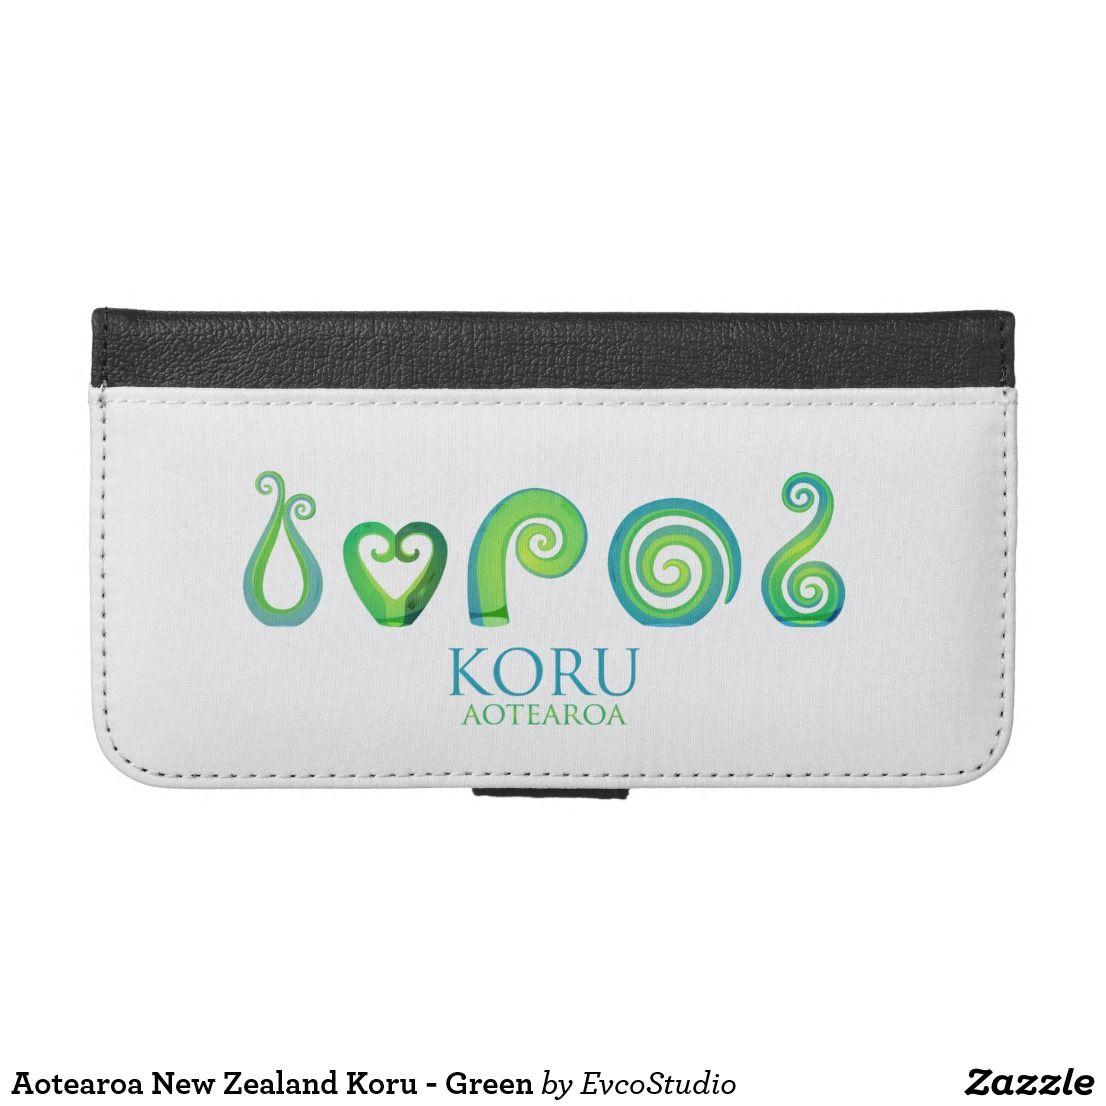 Aotearoa new zealand koru green iphone wallet case